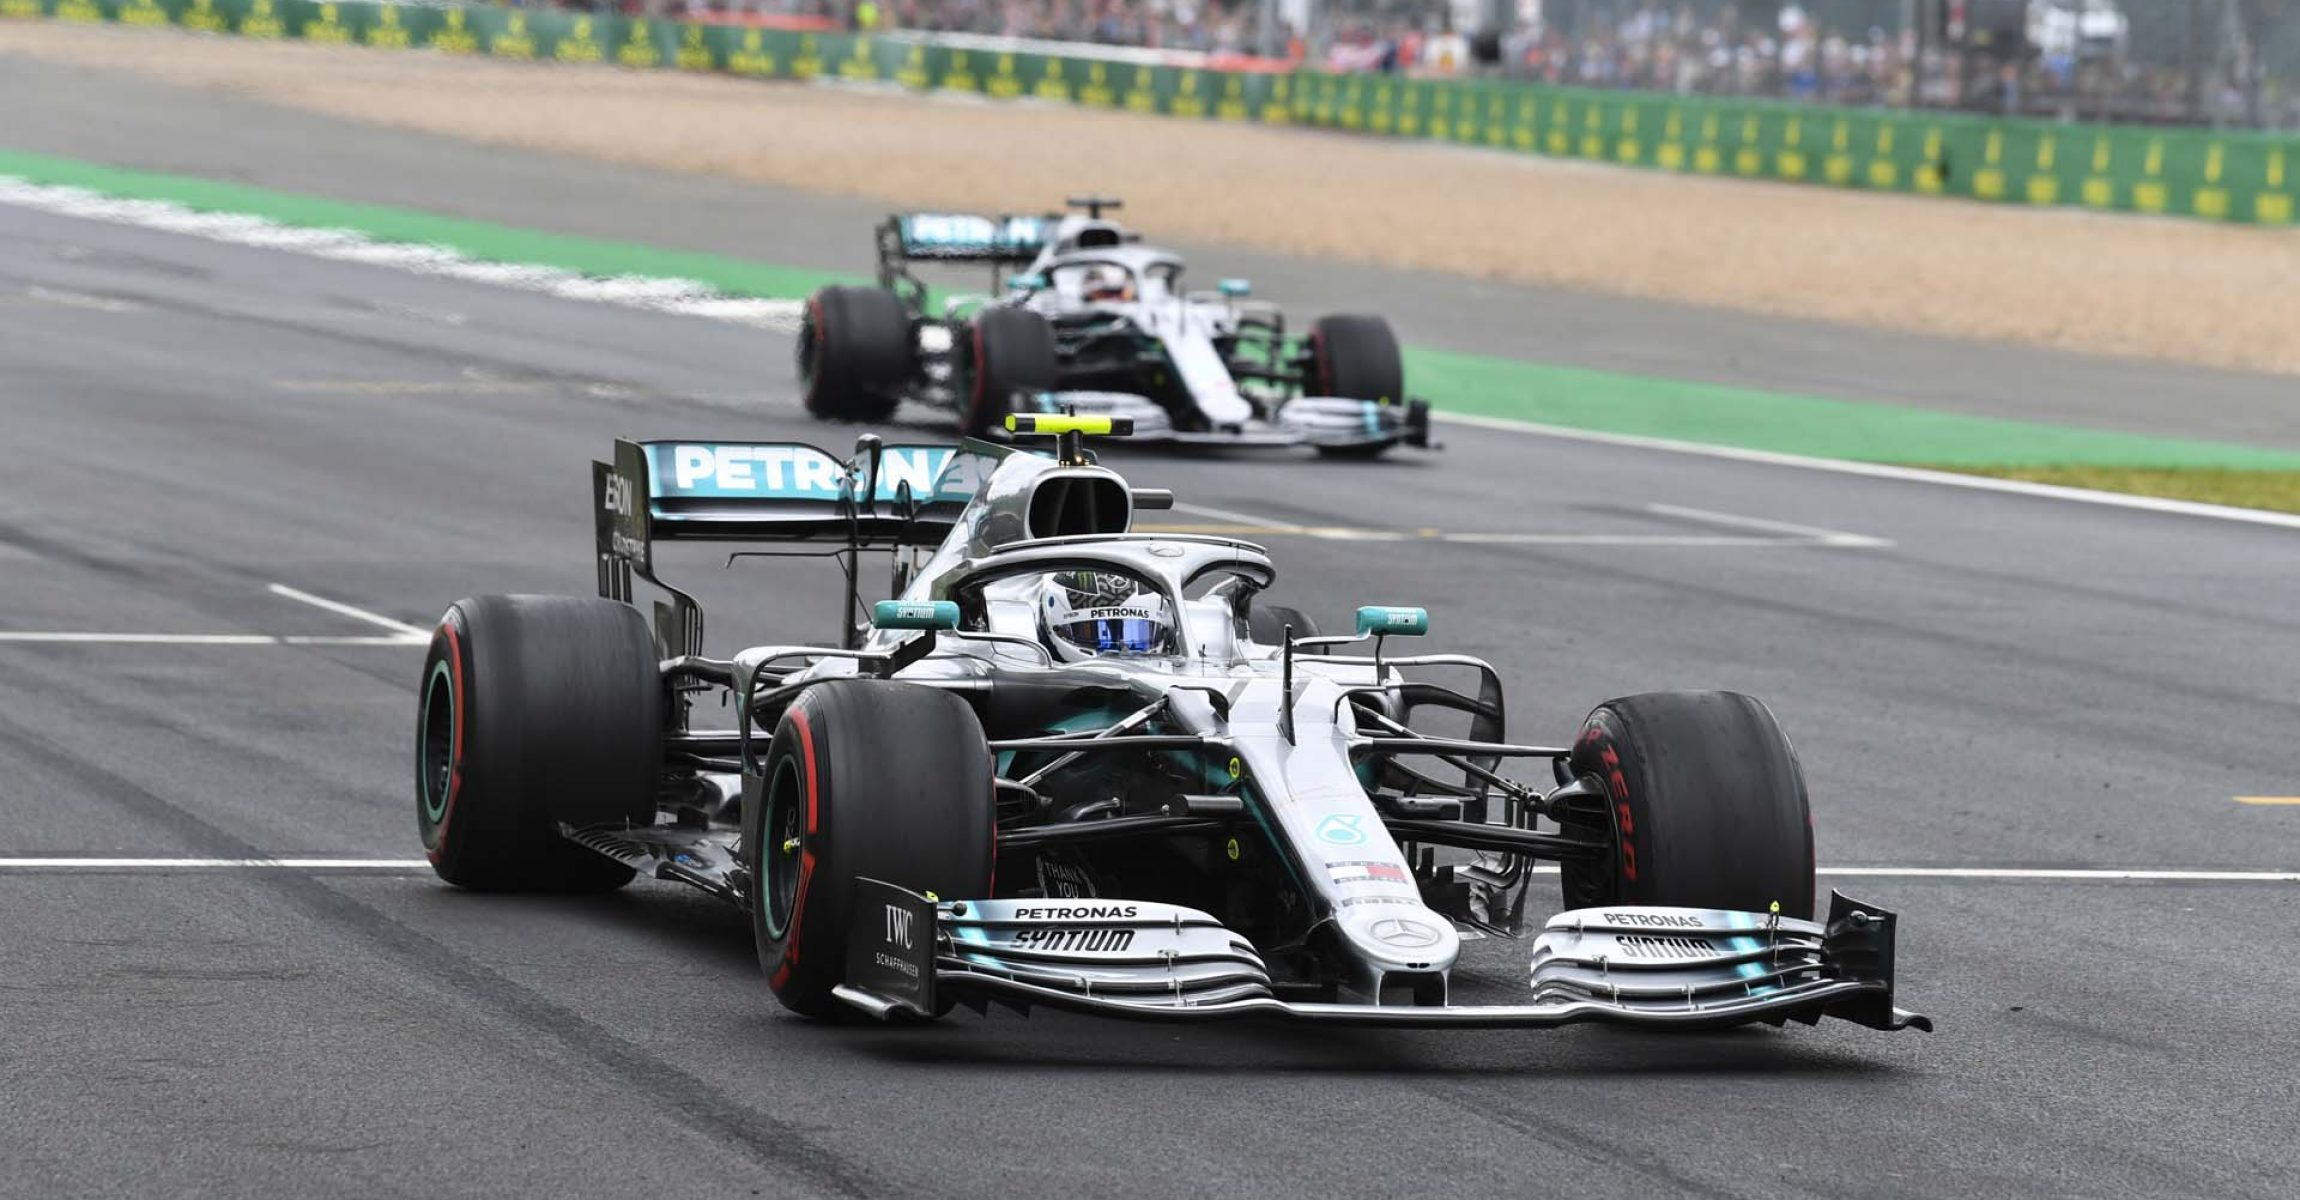 2019 British Grand Prix, Friday - LAT Images Valtteri Bottas Mercedes